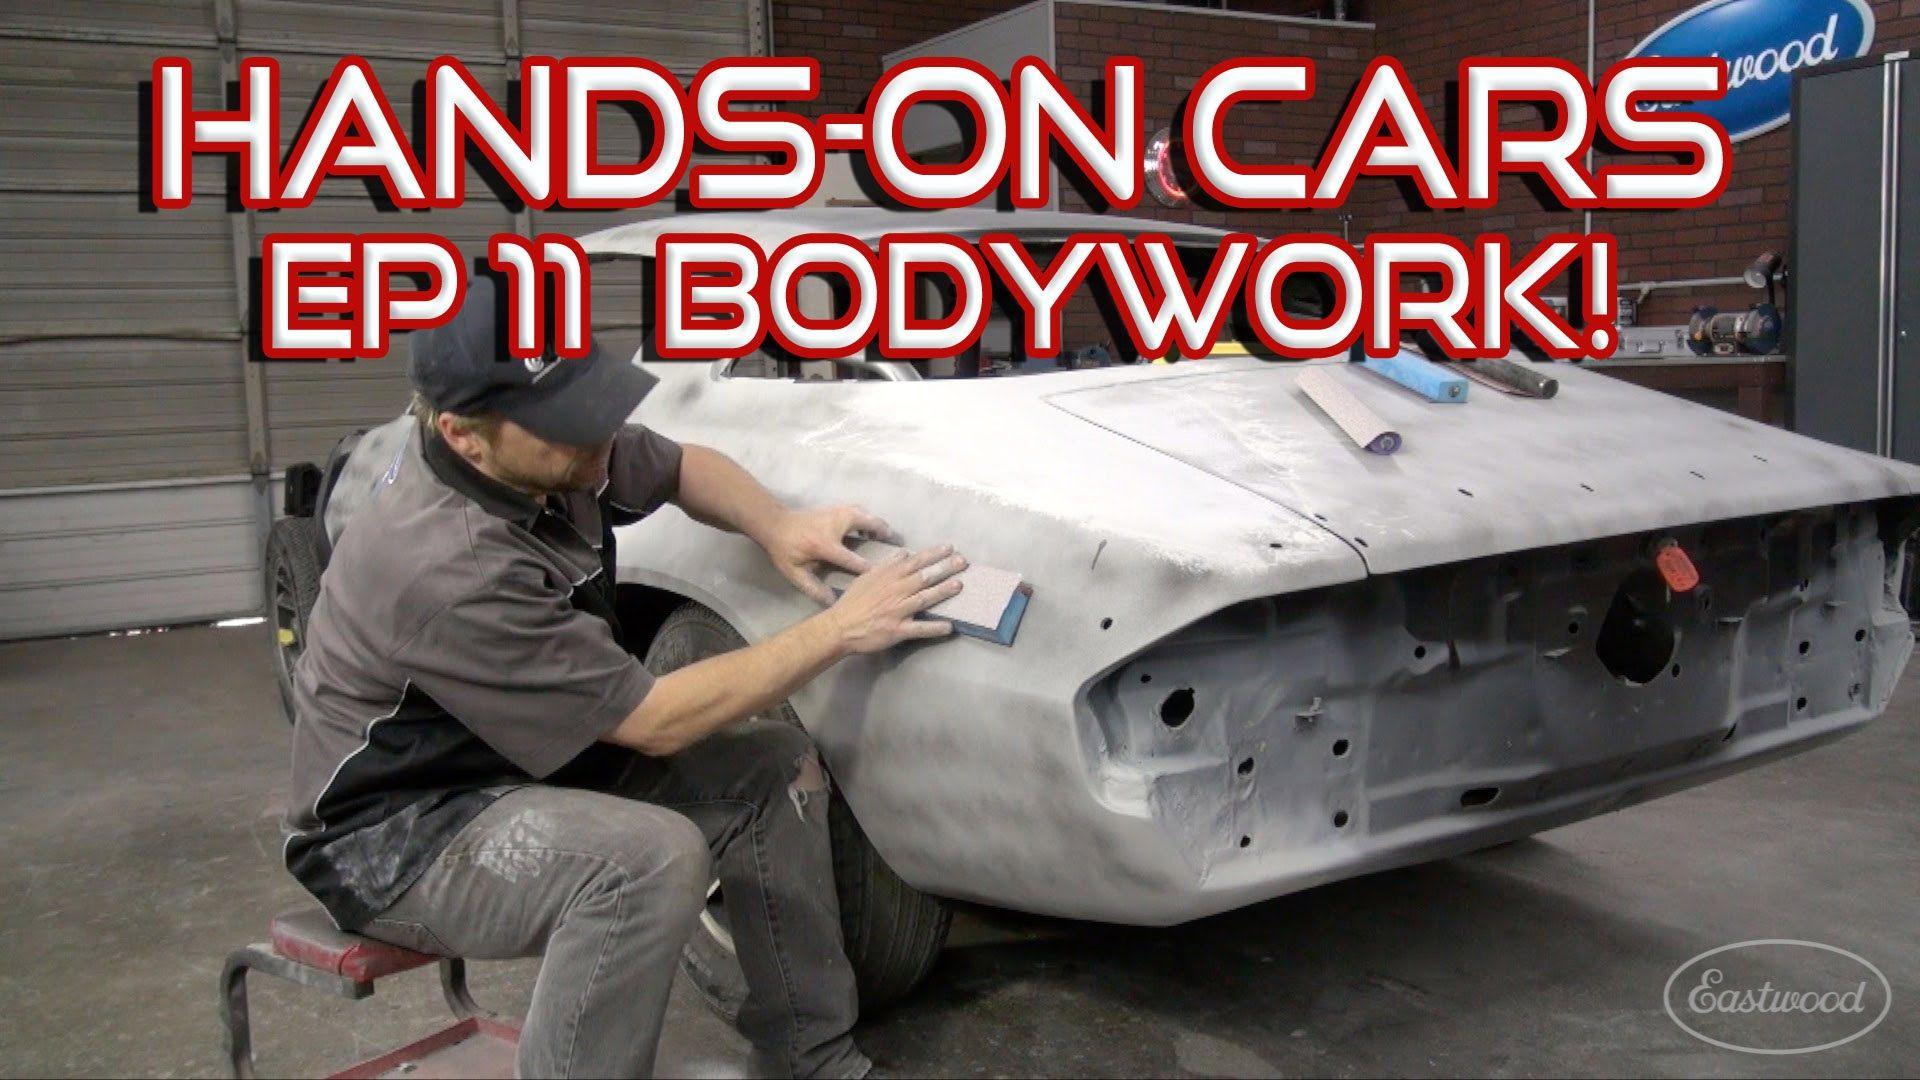 How To Bodywork A Car Spray Primer Surfacer On Hands On Cars 11 Get Automoblile